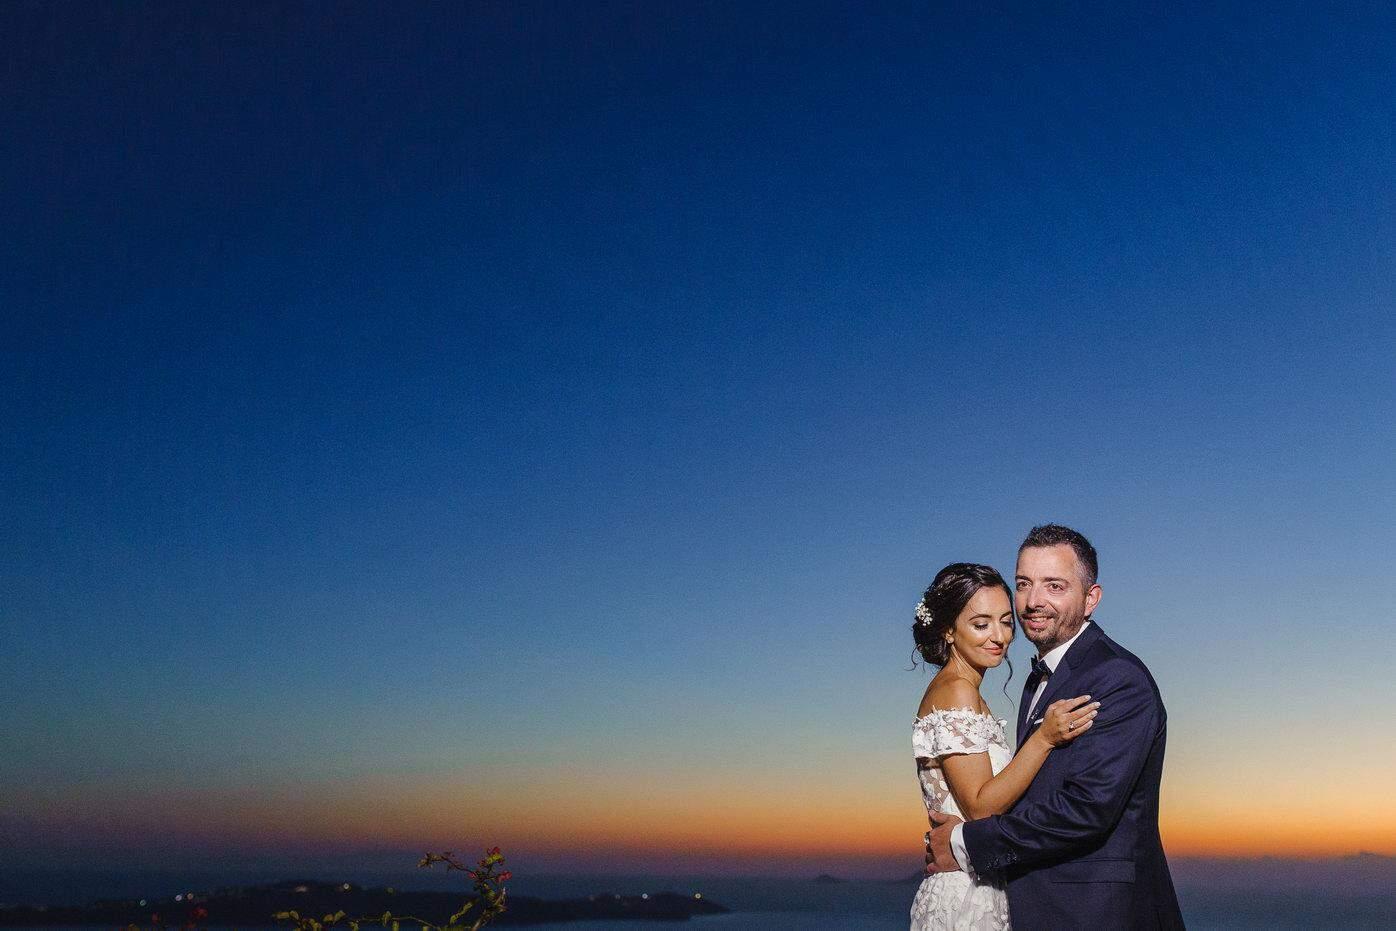 3342 Photographic - Destination wedding photography